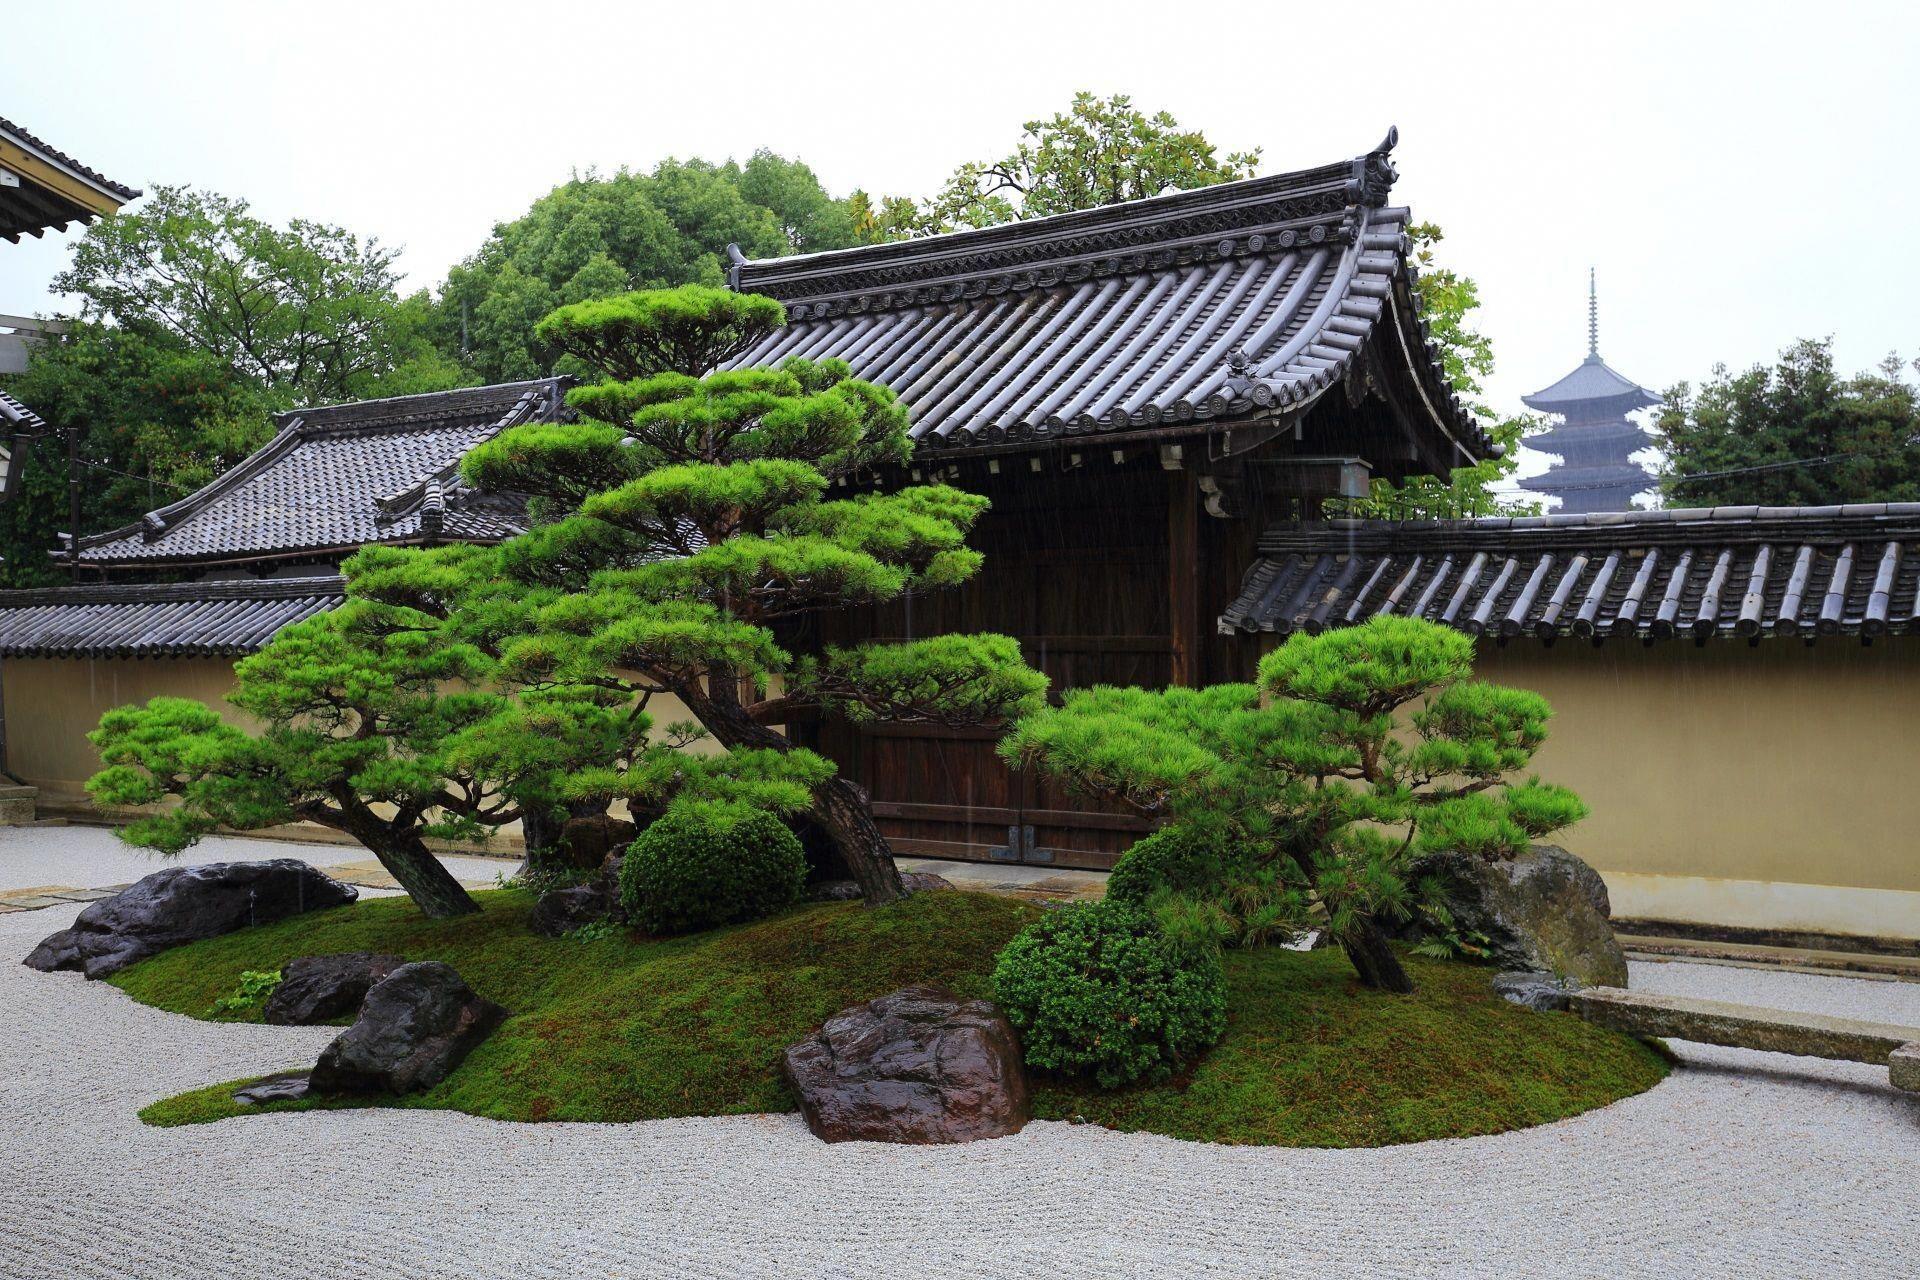 China Garten Elegant Zahrada Boha StarÅ¡ch A Pětpodlažn Pagoda